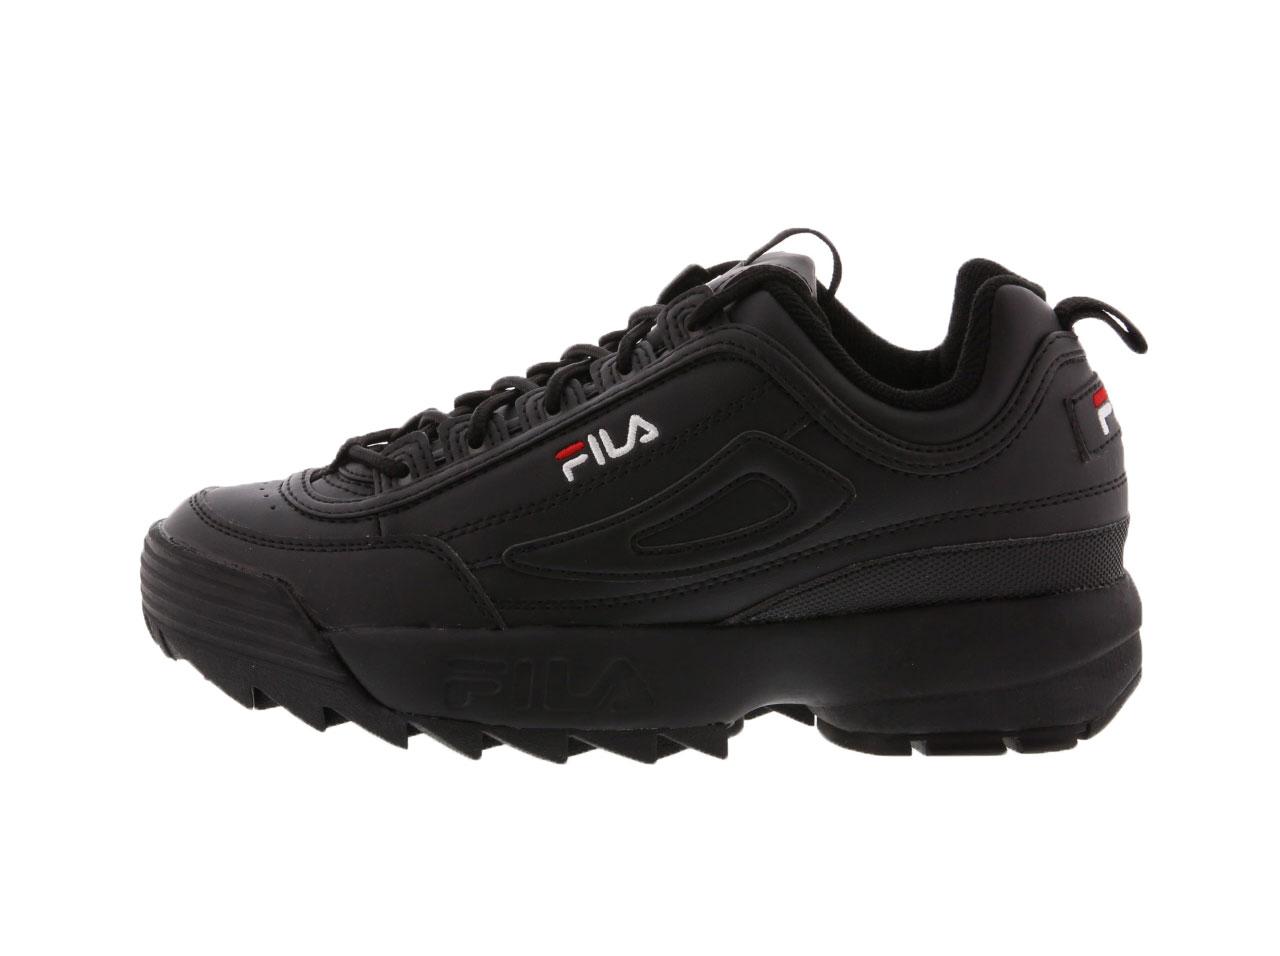 FILA DISRUPTOR 2 -F0215-1073)【フィラ ディスラプター2】【シューズ】【スニーカー】【靴】【フットウェア】【ストアレビュー記載でソックスプレゼント対象品】